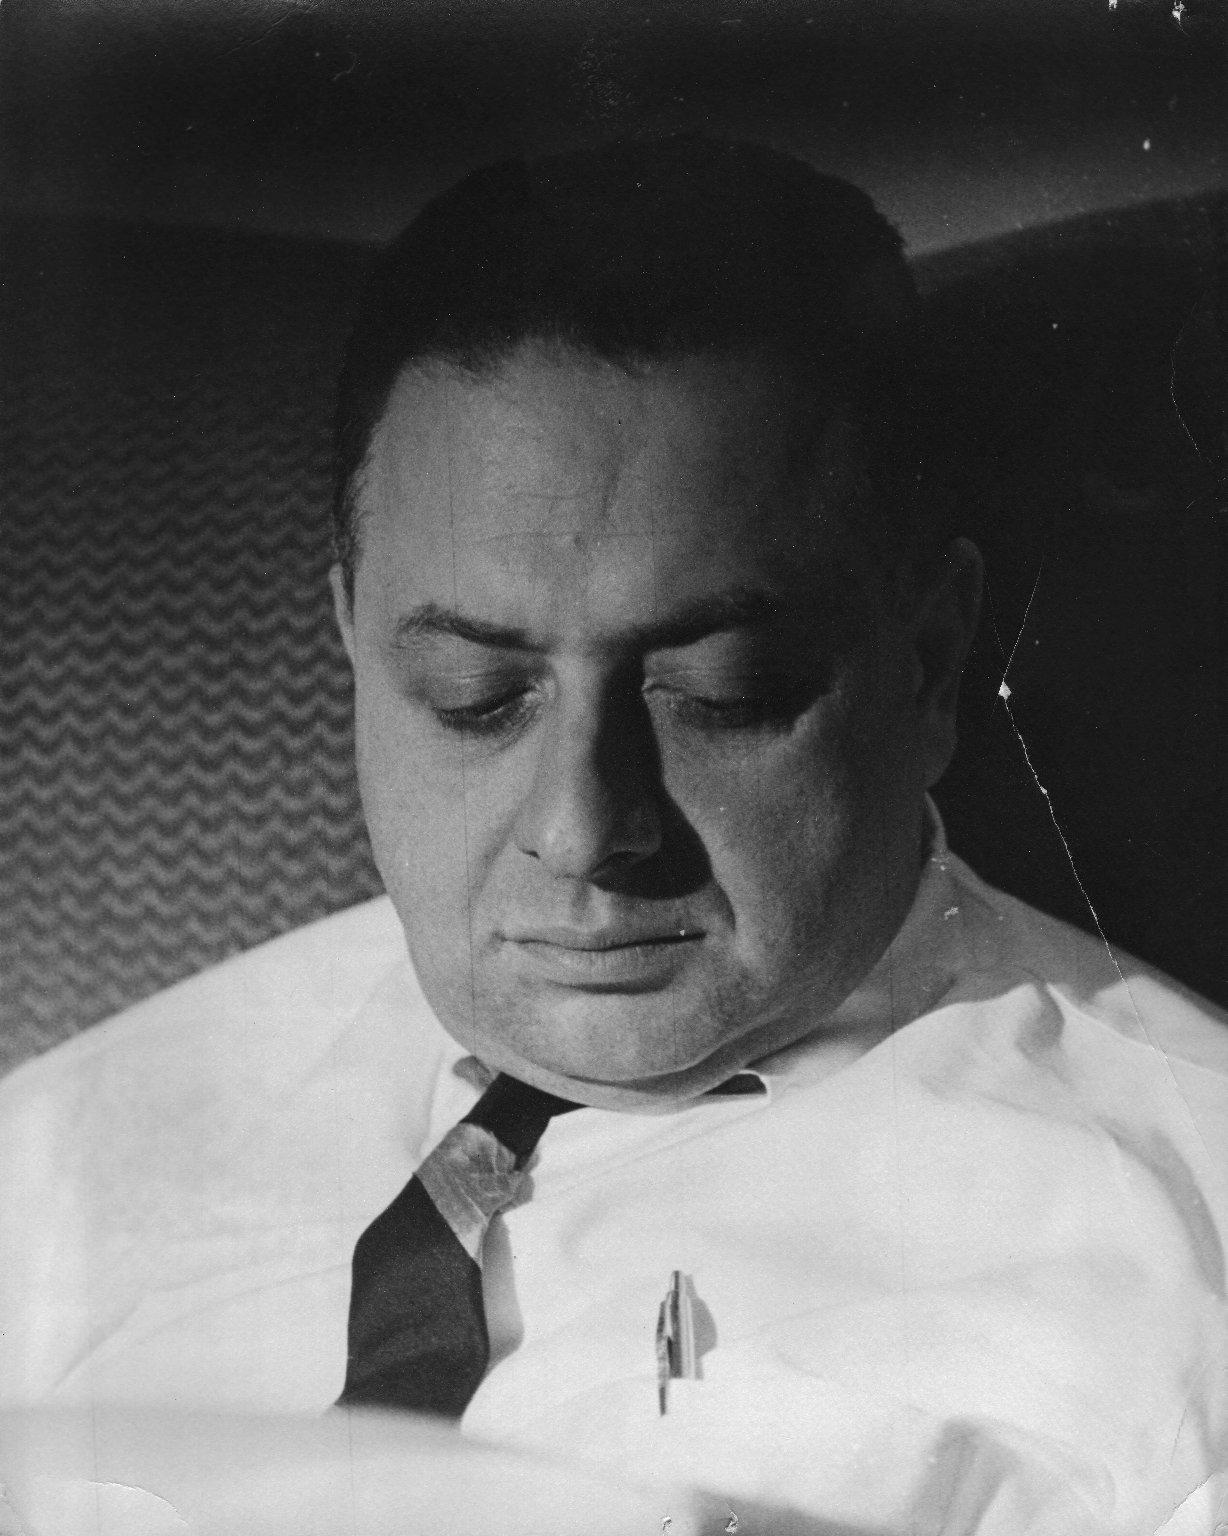 Rabbi Arnold Jacob Wolf, rabbi of Congregation Solel, in Highland Park, Illinois, ca. 1962.